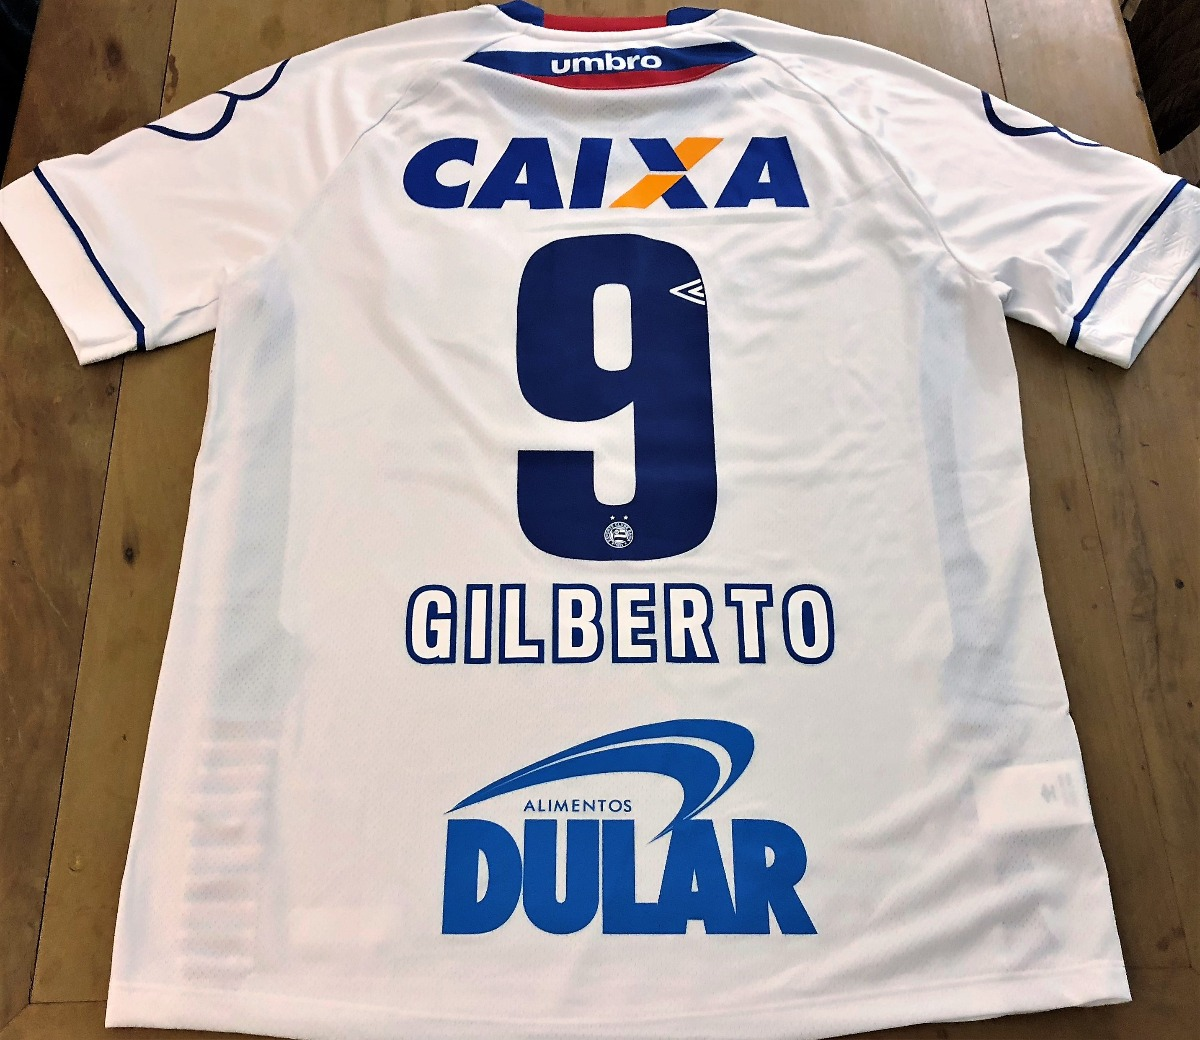 Camisa Bahia Copa Do Nordeste 2018 De Jogo Gilberto  9 - R  429 b7f30e9c5a0ca